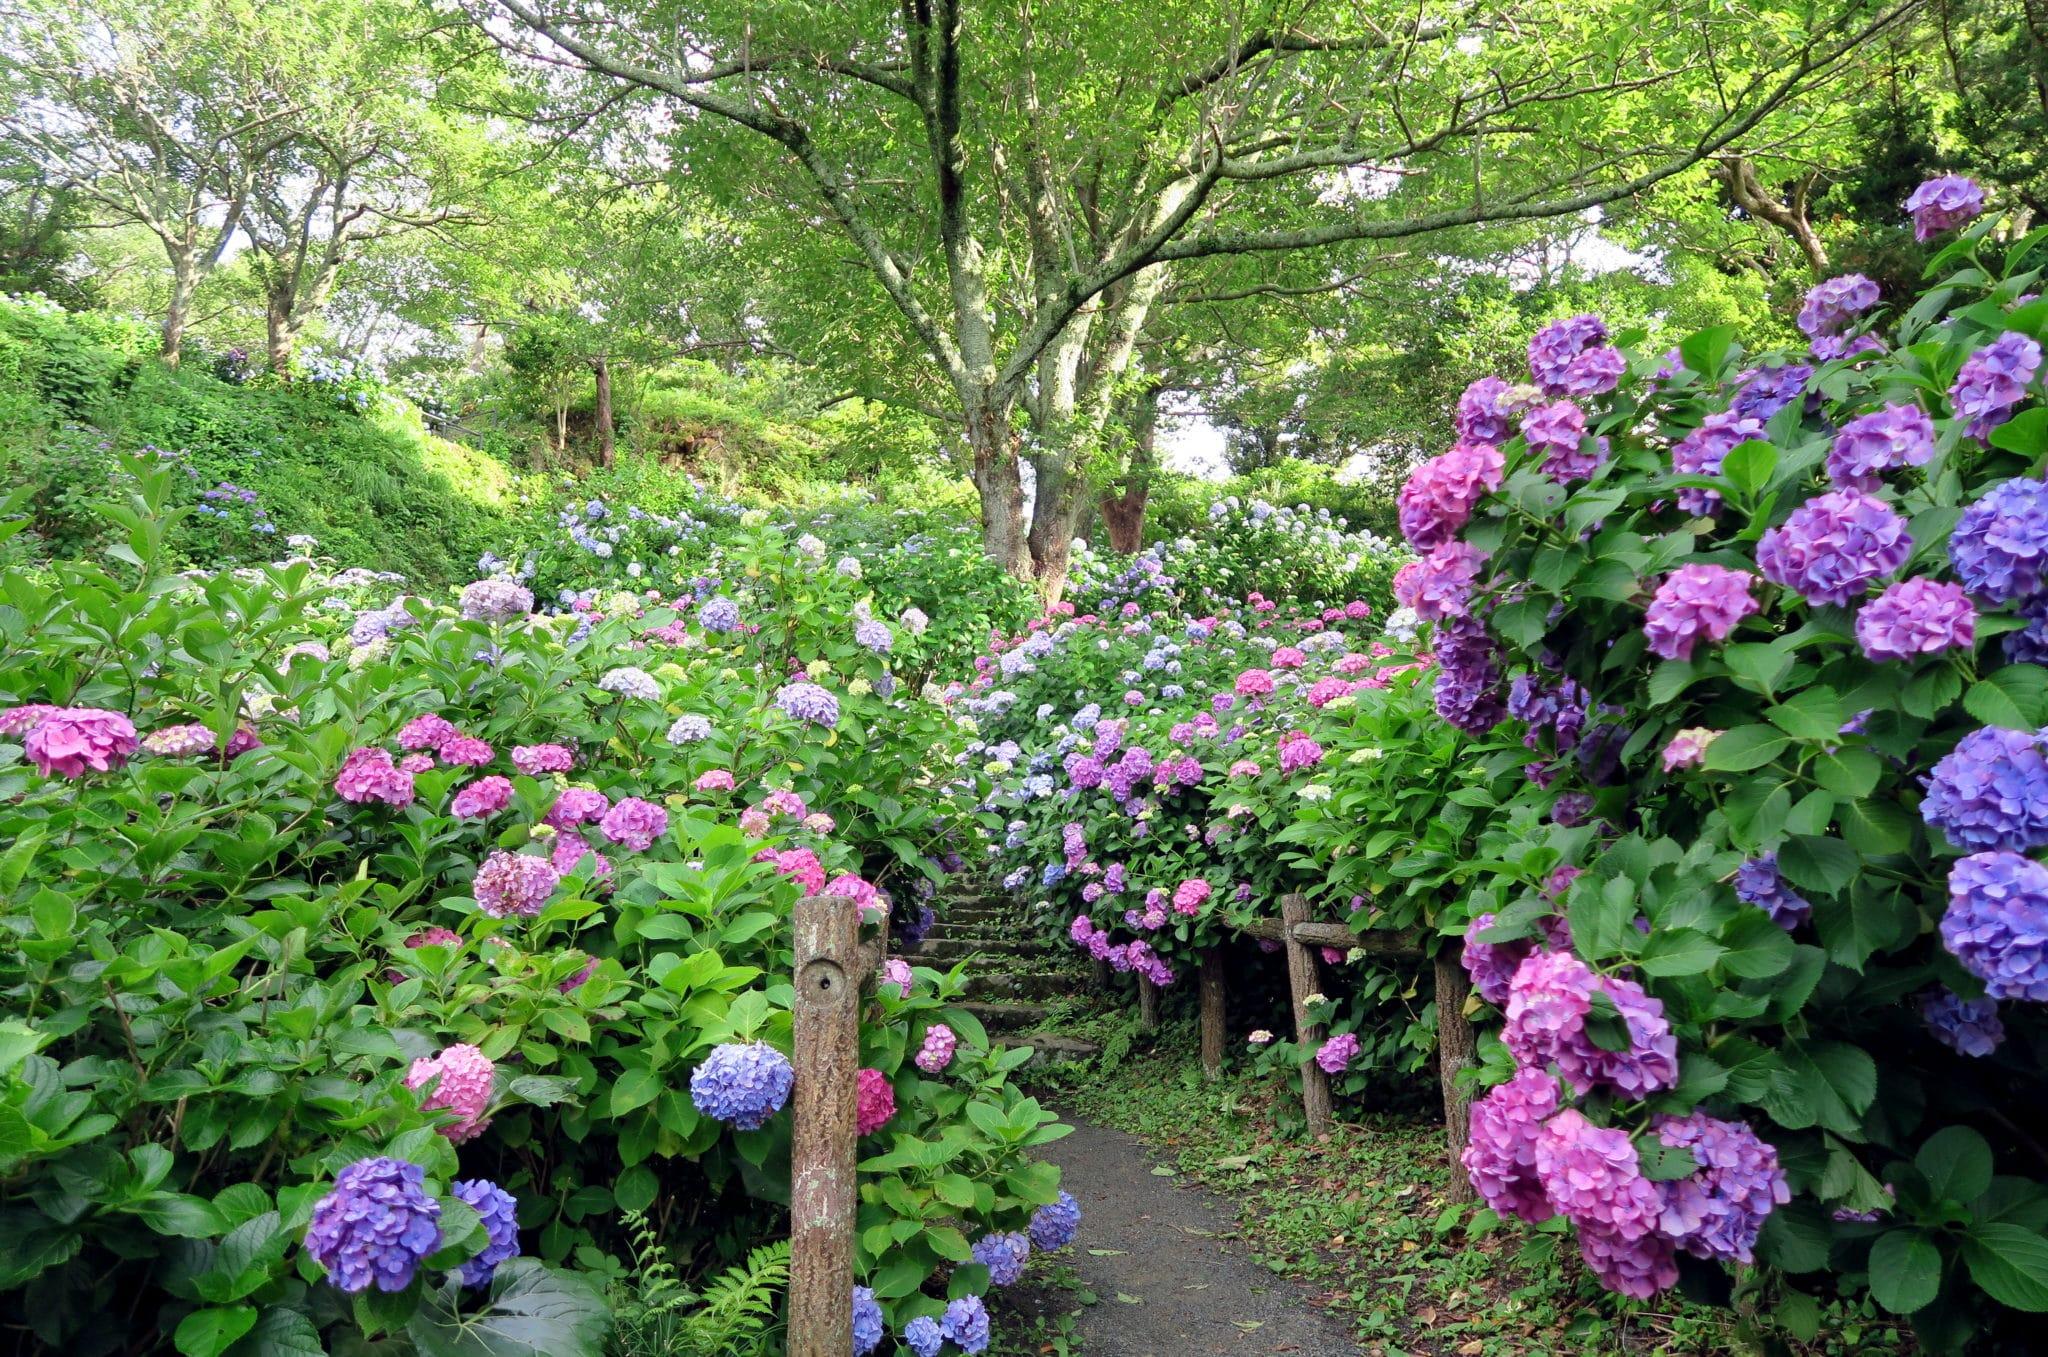 Hydrangea Shimoda Park Izu Peninsula Japan